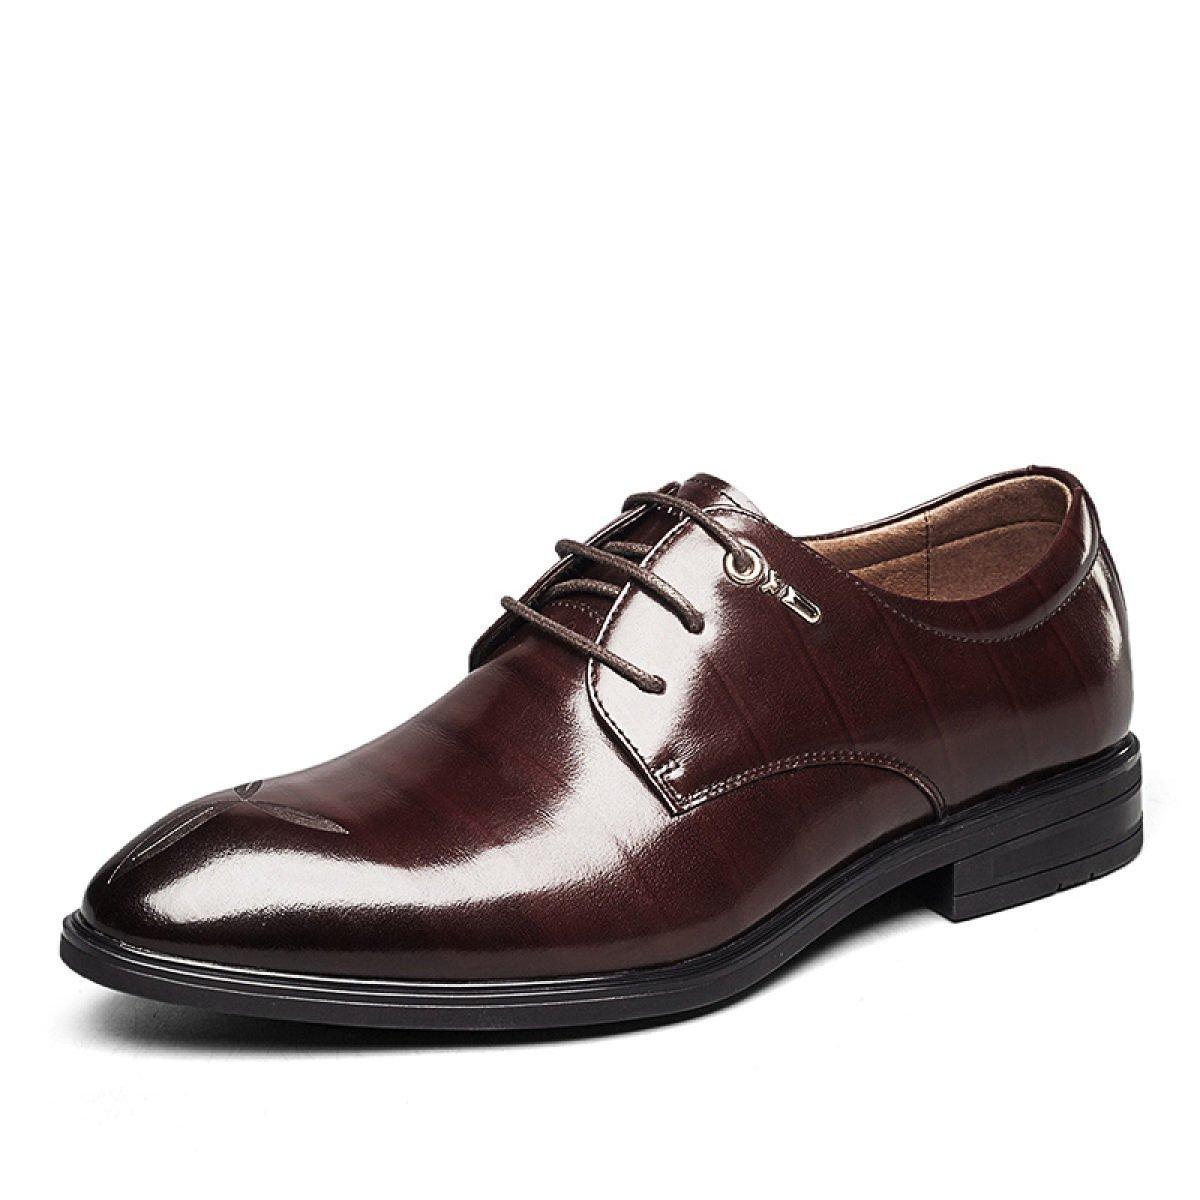 Herren Herren Herren Oxfords Leder Kleid Schuhe Modern Classic Casual Lace-up Herren Bequeme Schuhe Formale Business-Schuhe Für Männer 8a8f1c